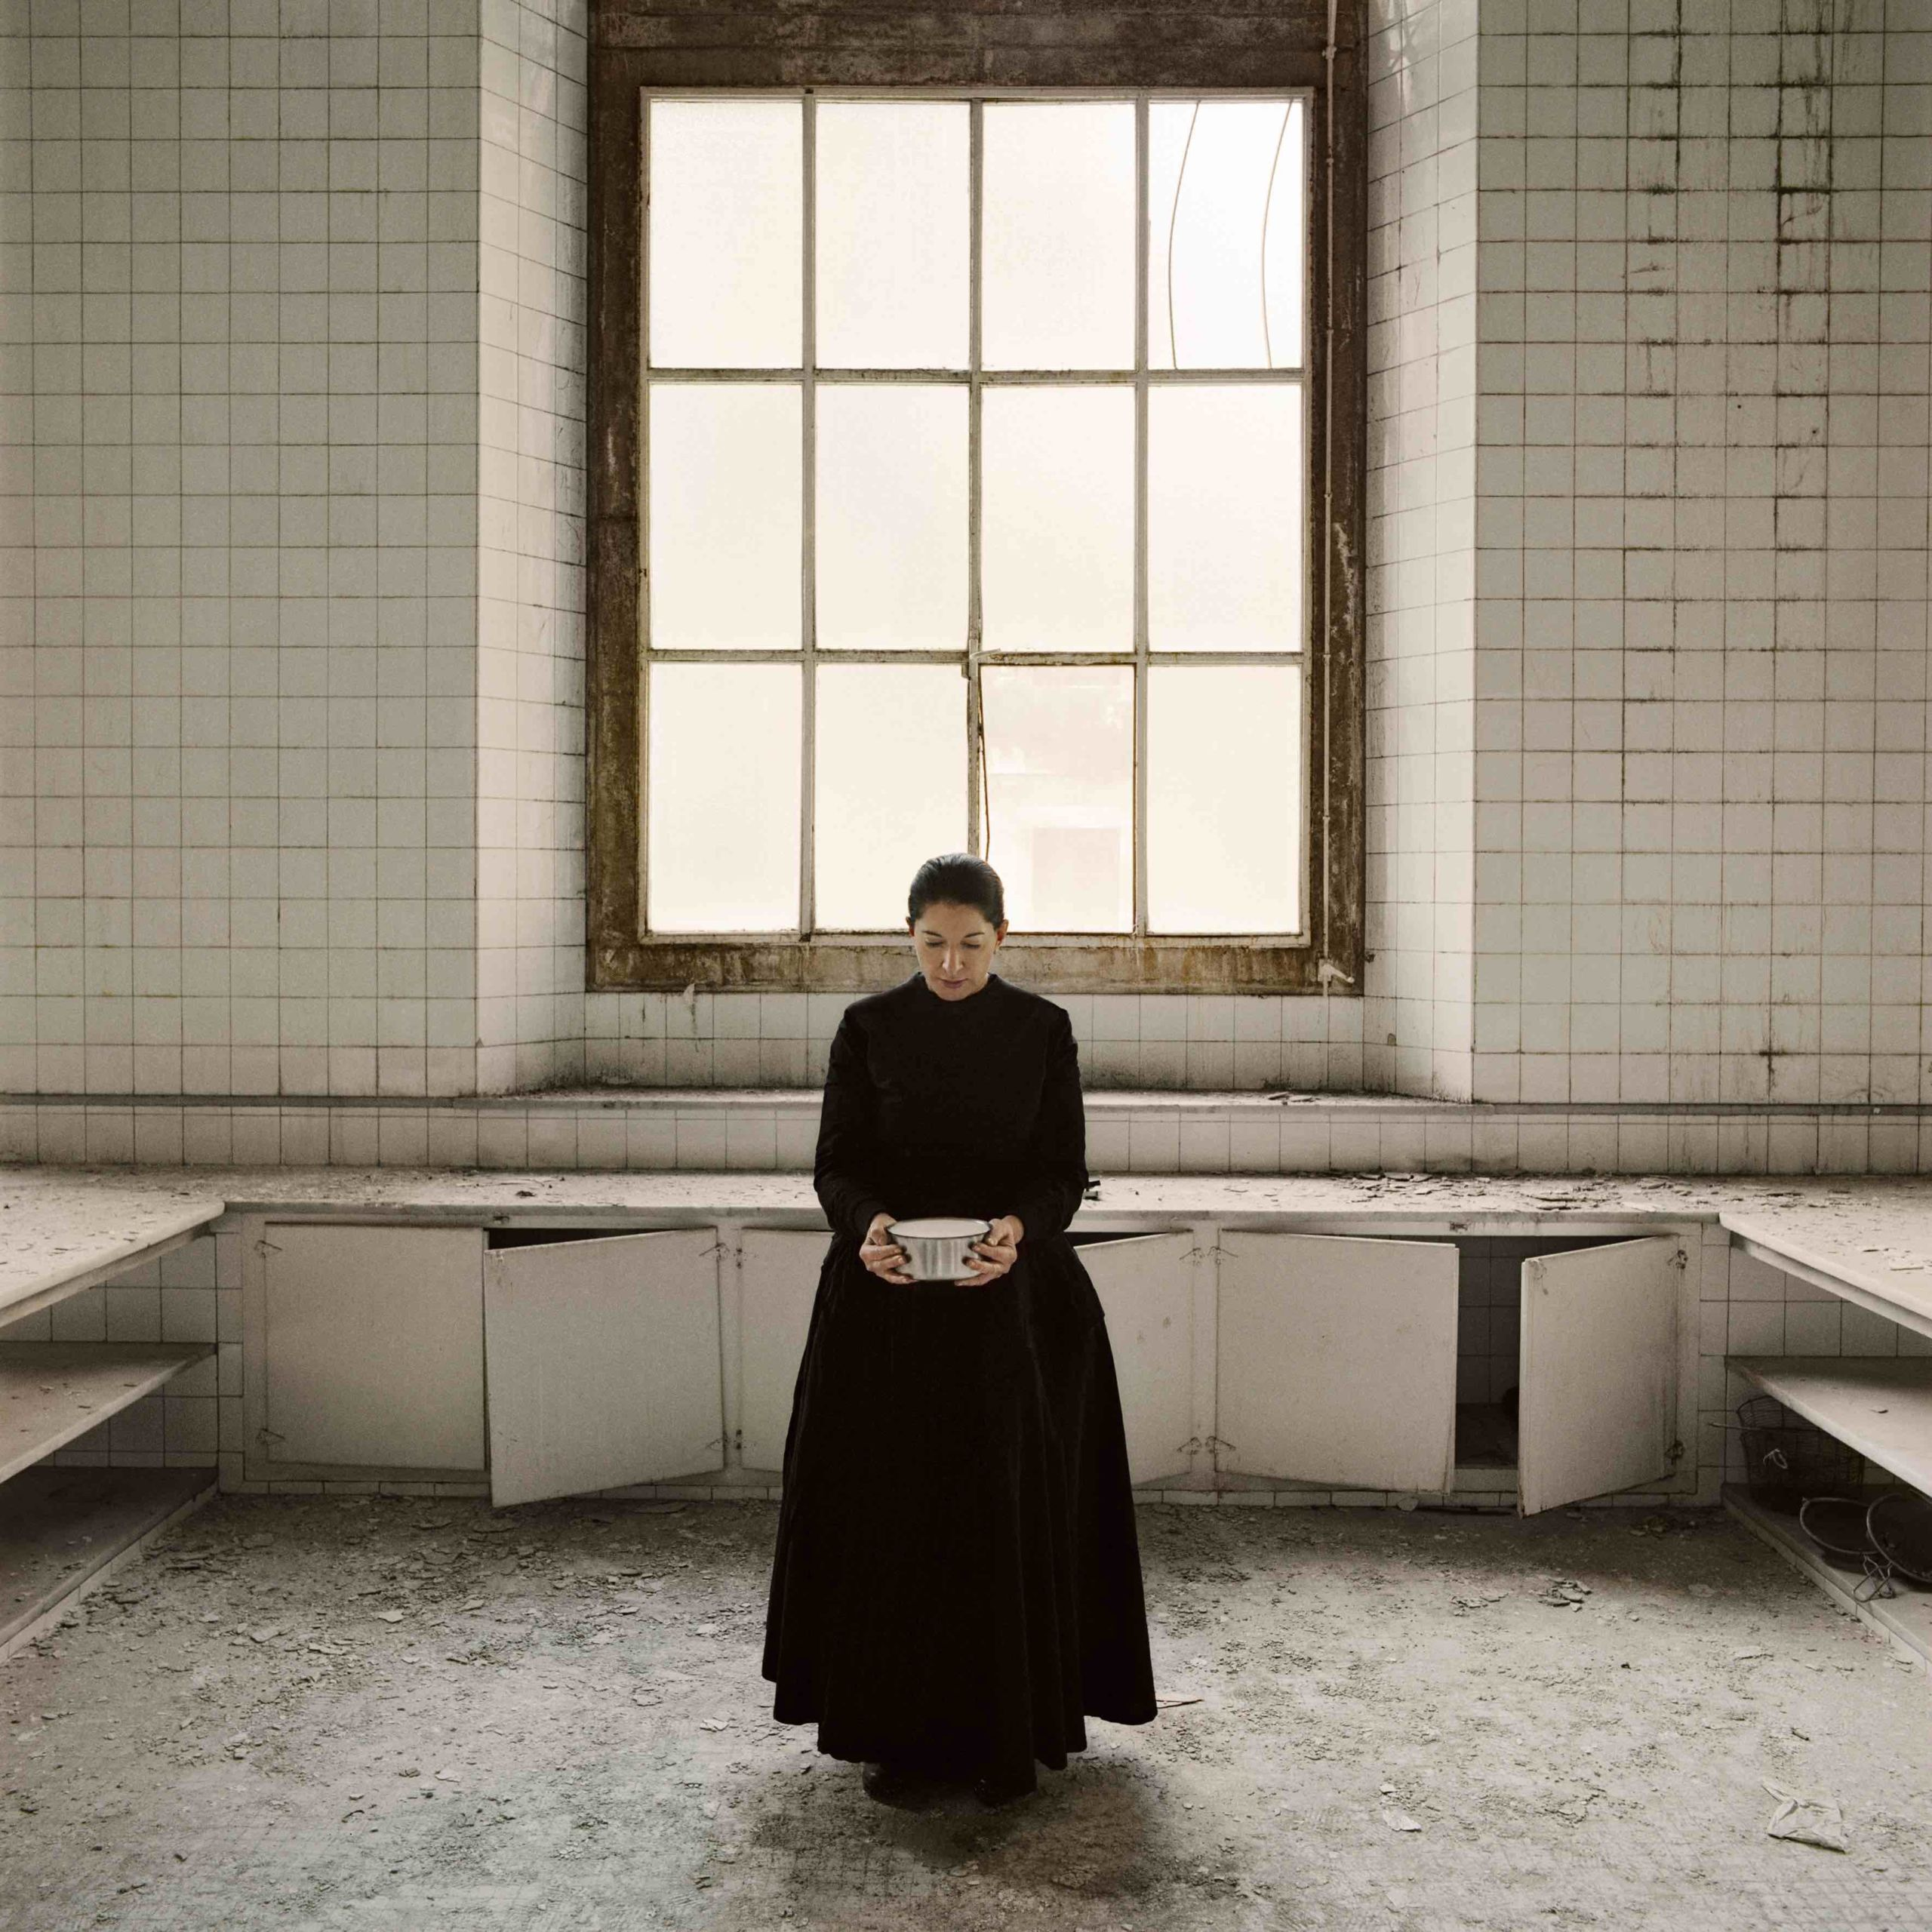 Marina Abramović, The Kitchen. Homage to Saint Therese